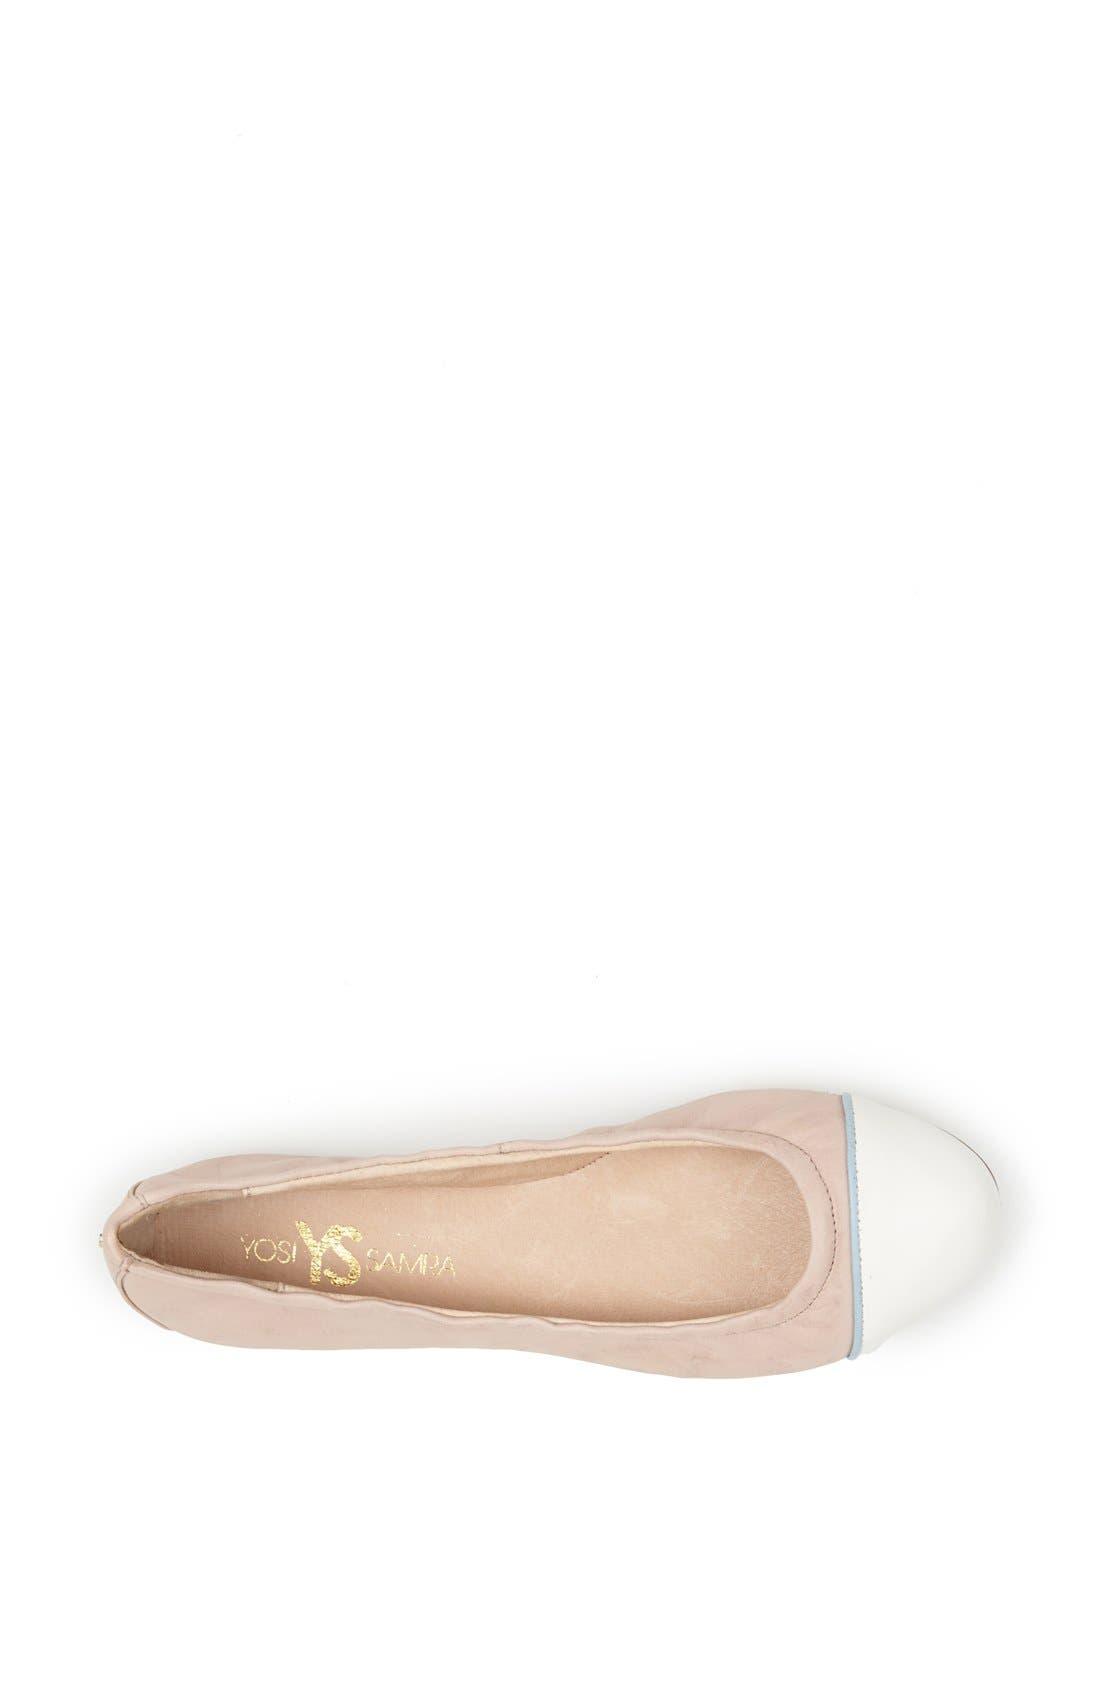 Alternate Image 3  - Yosi Samra 'Marni' Foldable Ballet Flat